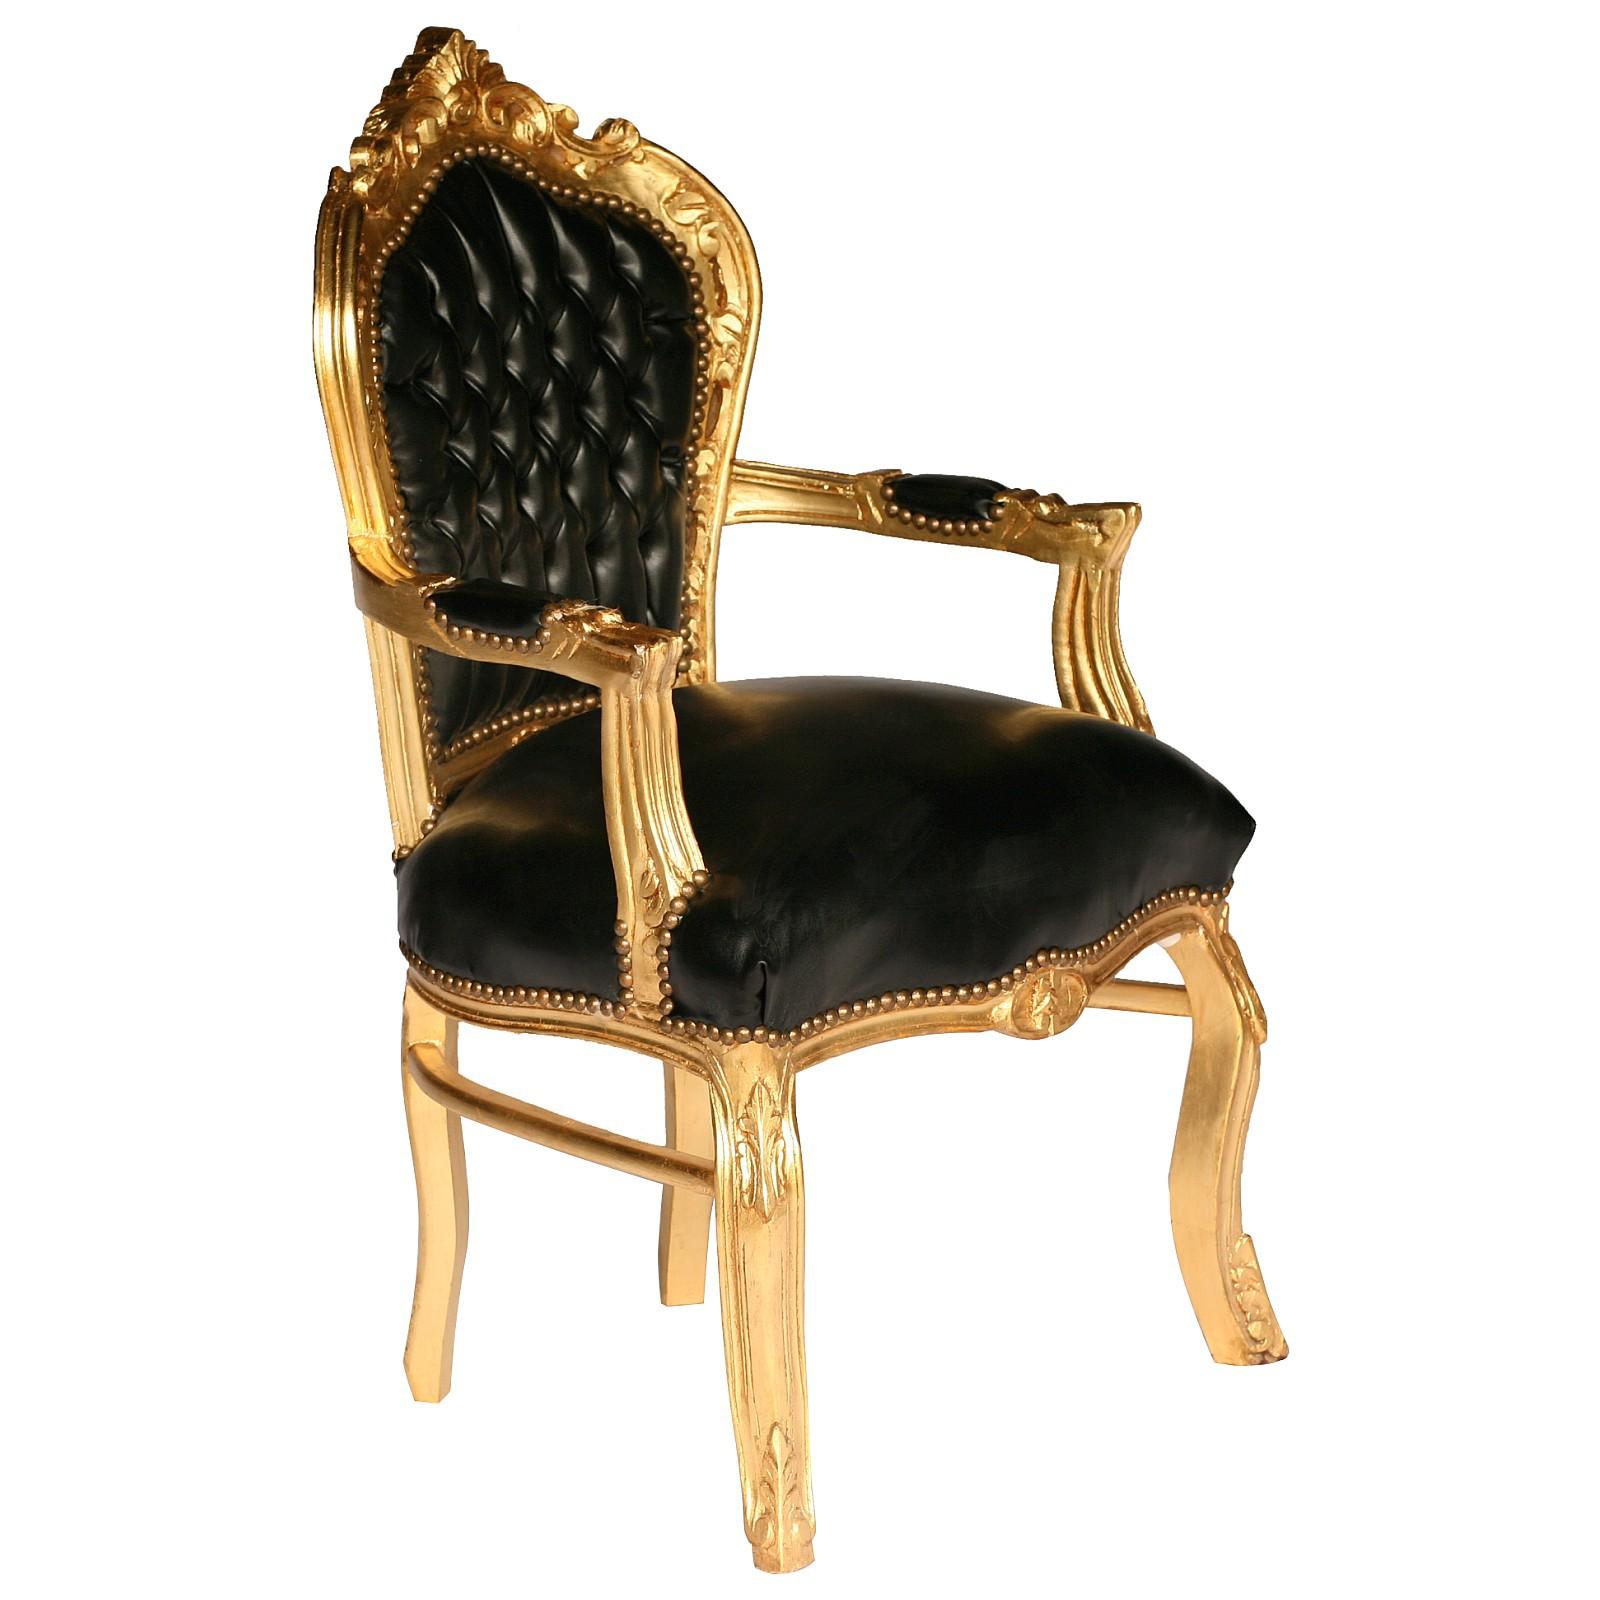 Black Carver Accent Dining Chair In Antique Baroque Furniture Style U2013 Bild 2